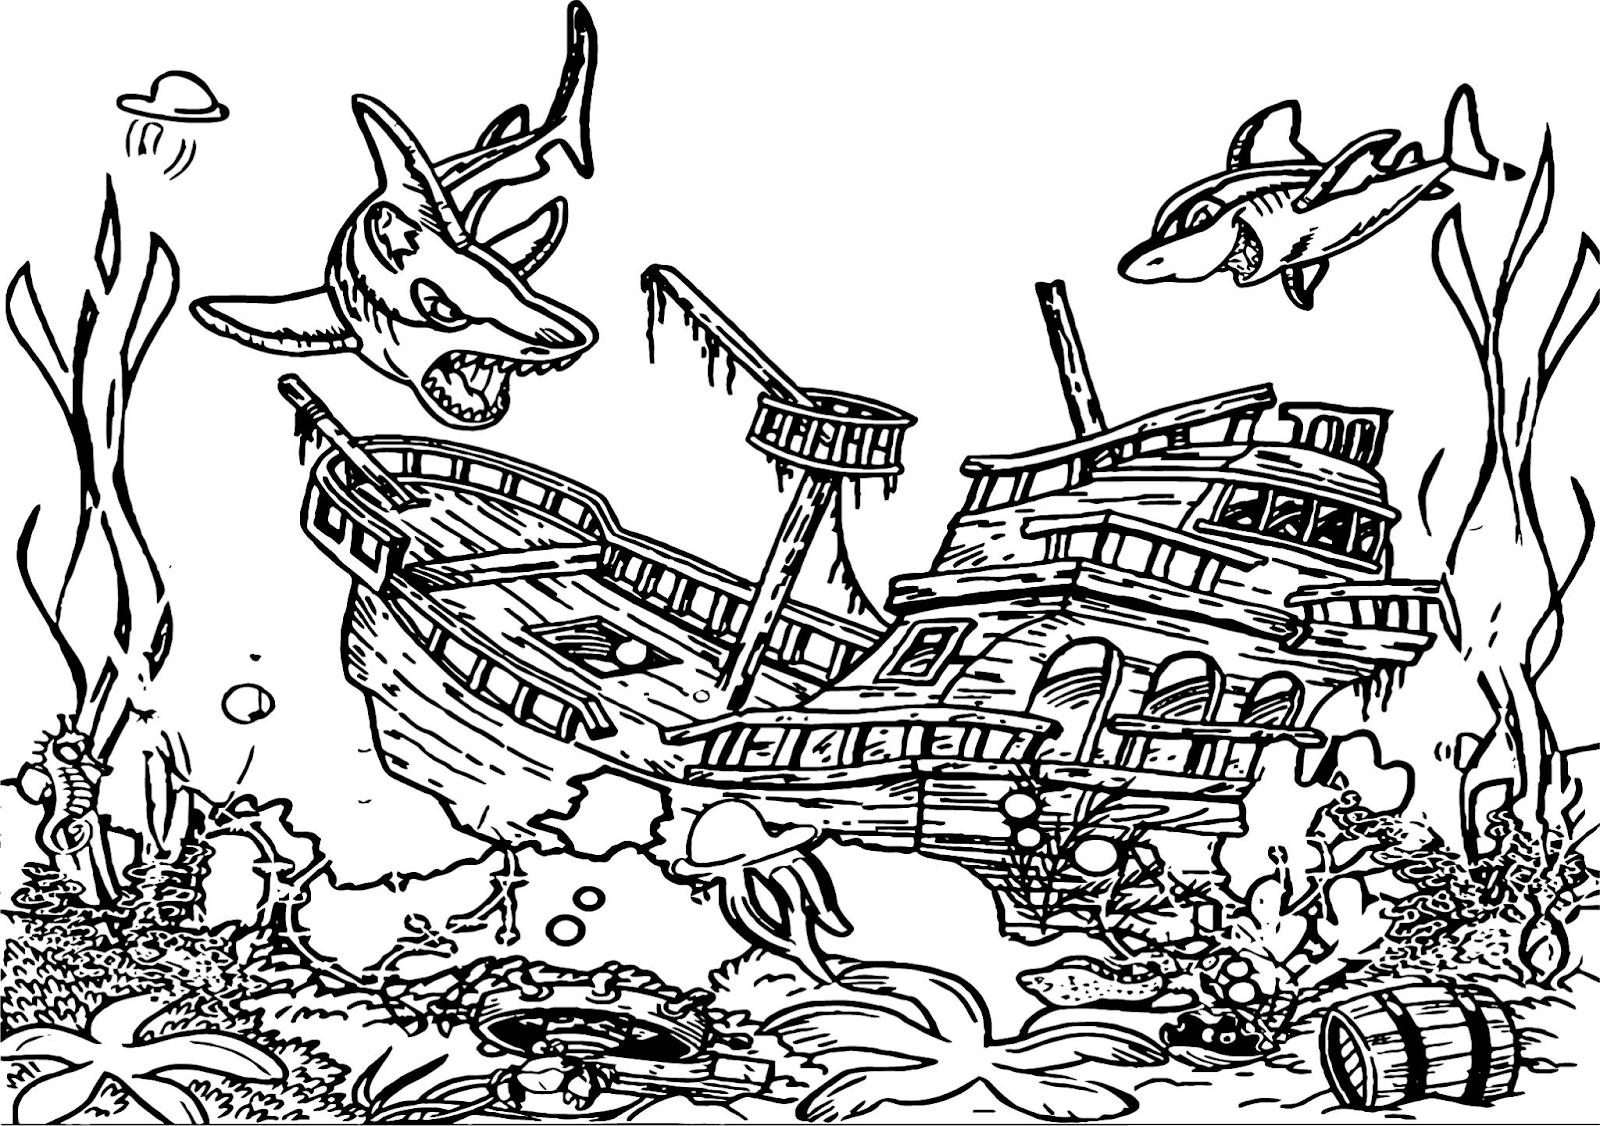 Gambar Mewarnai Pemandangan Bawah Laut Anak TK PAUD SD Terbaru